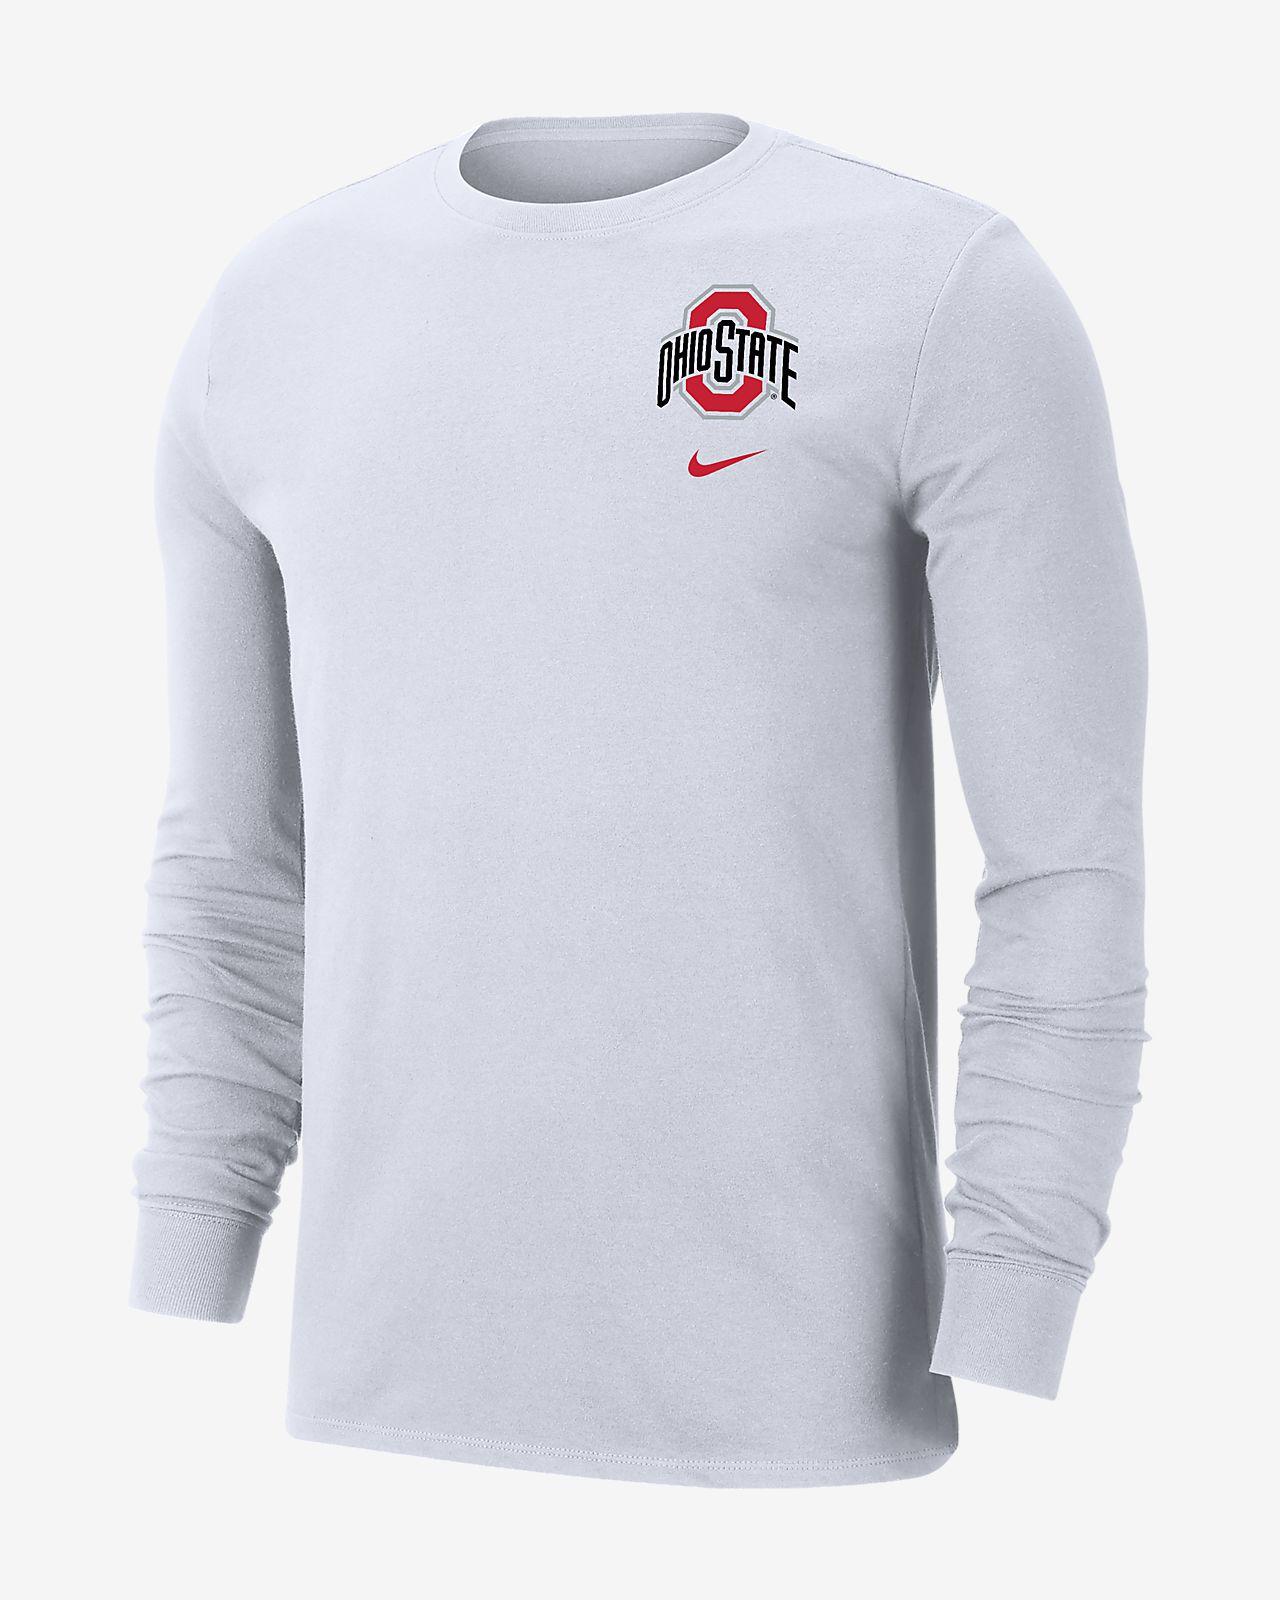 Nike College (Ohio State) Men's Long-Sleeve T-Shirt